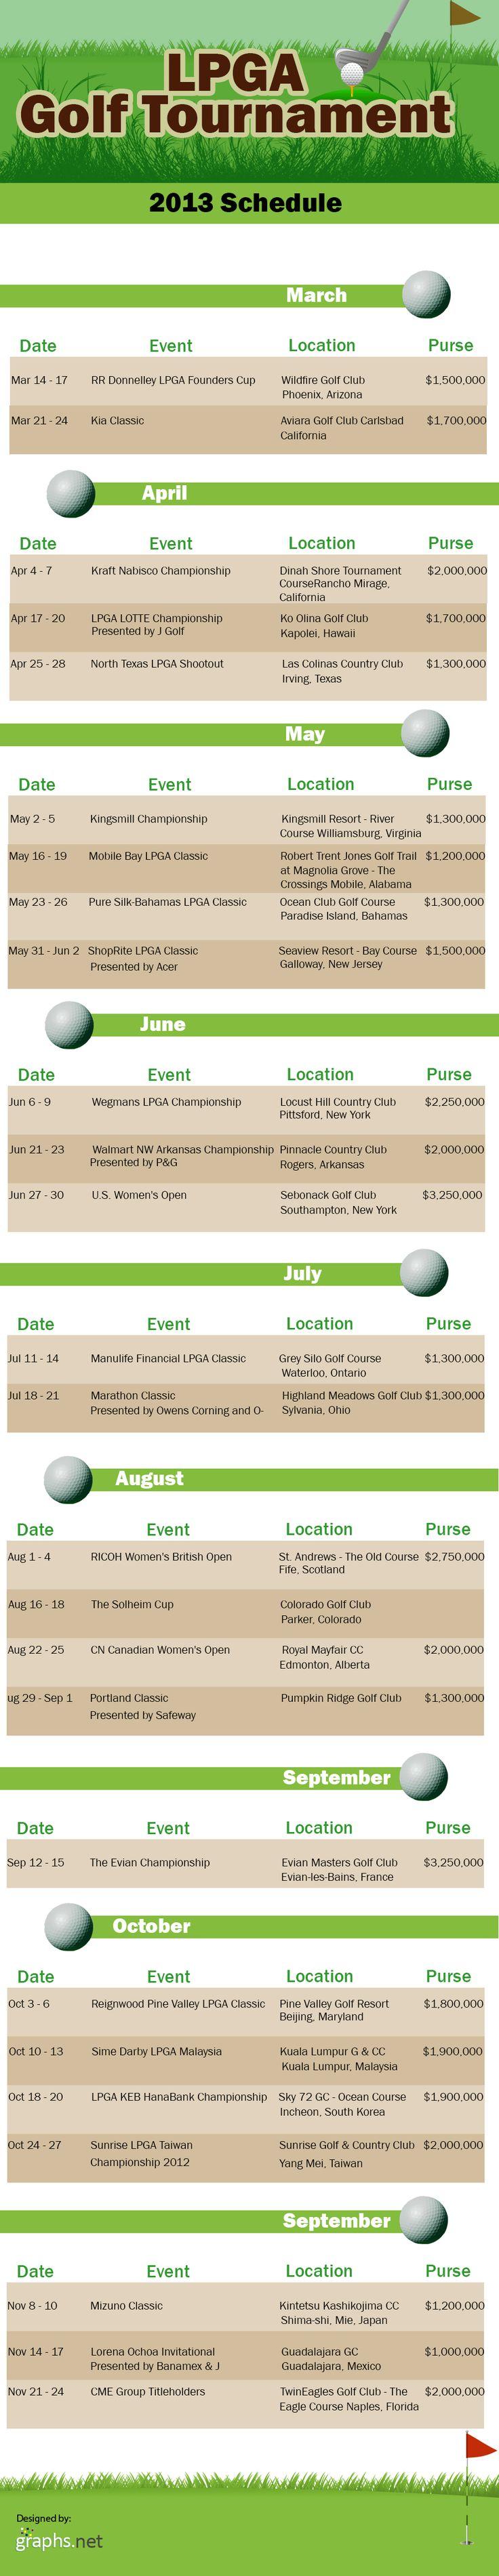 lpga golf tournament 2013 schedule #lpga #golf #tournament #2013 #schedule #Sports #Infographics